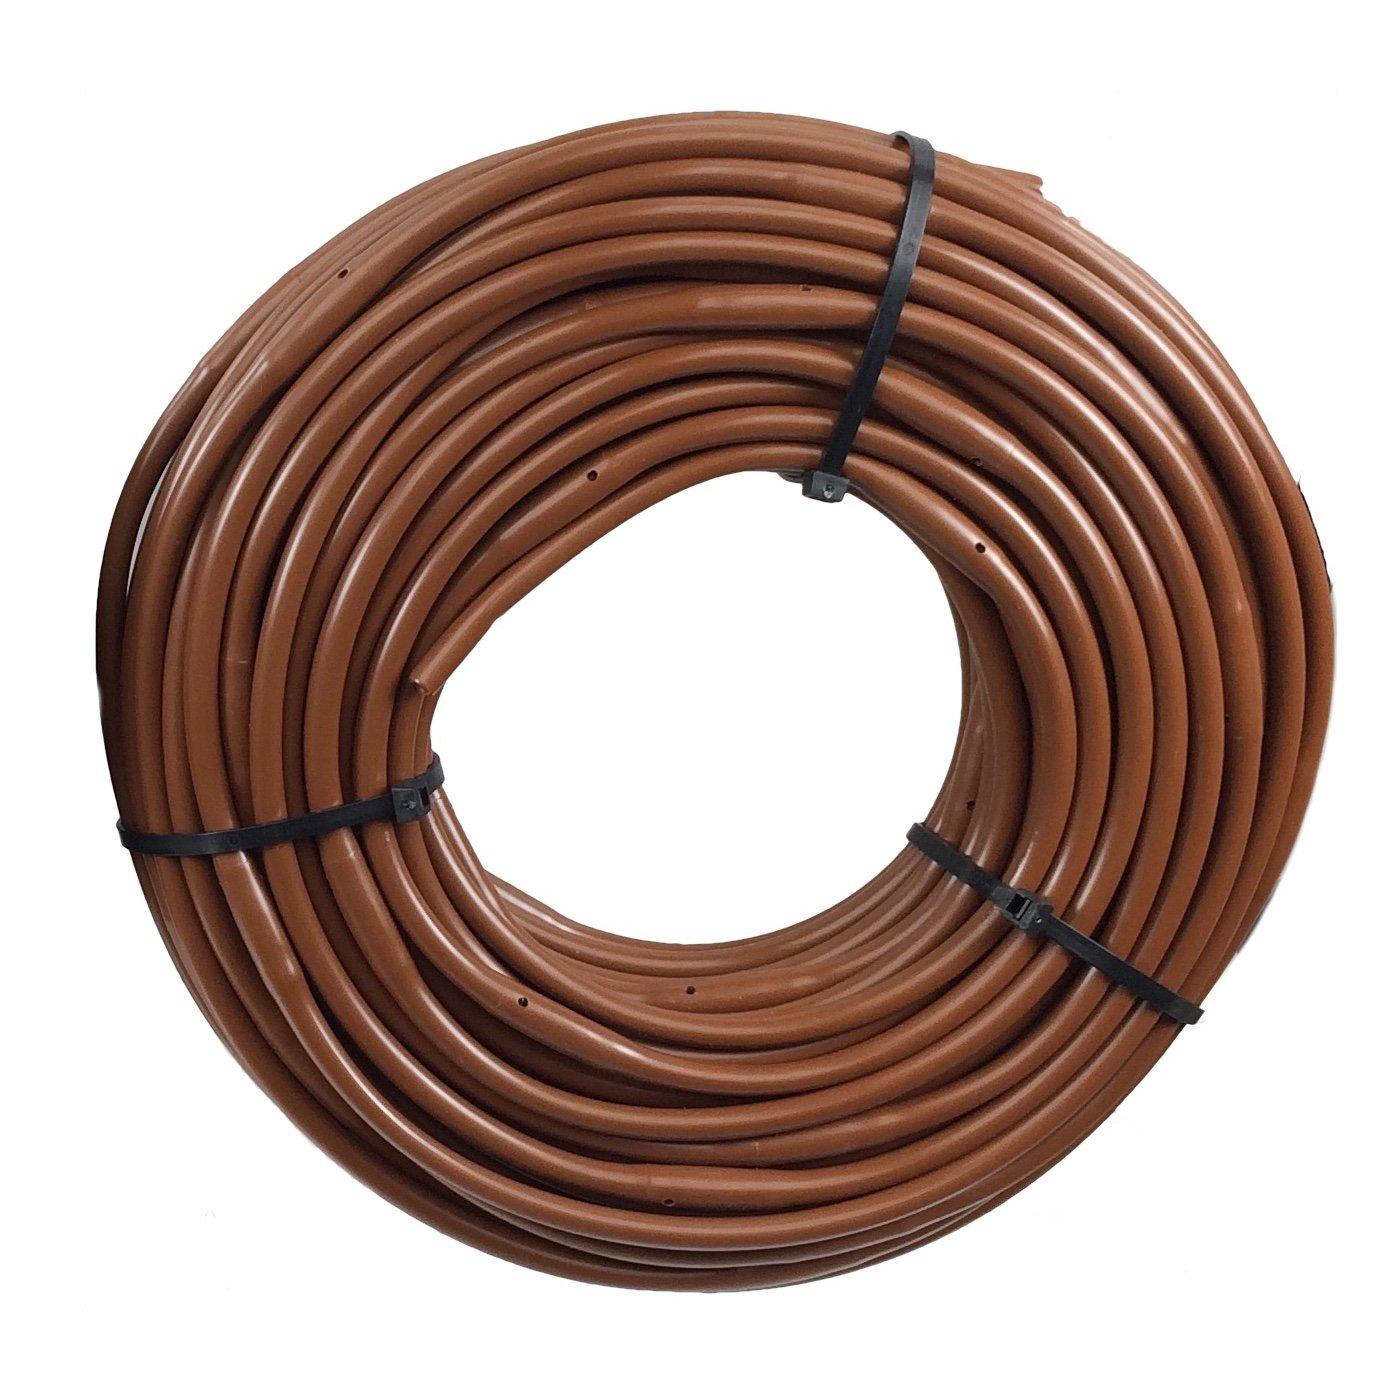 1/4 Poly Dripline 9'' Spacing 0.5 GPH 100' Roll Brown Drip Tubing